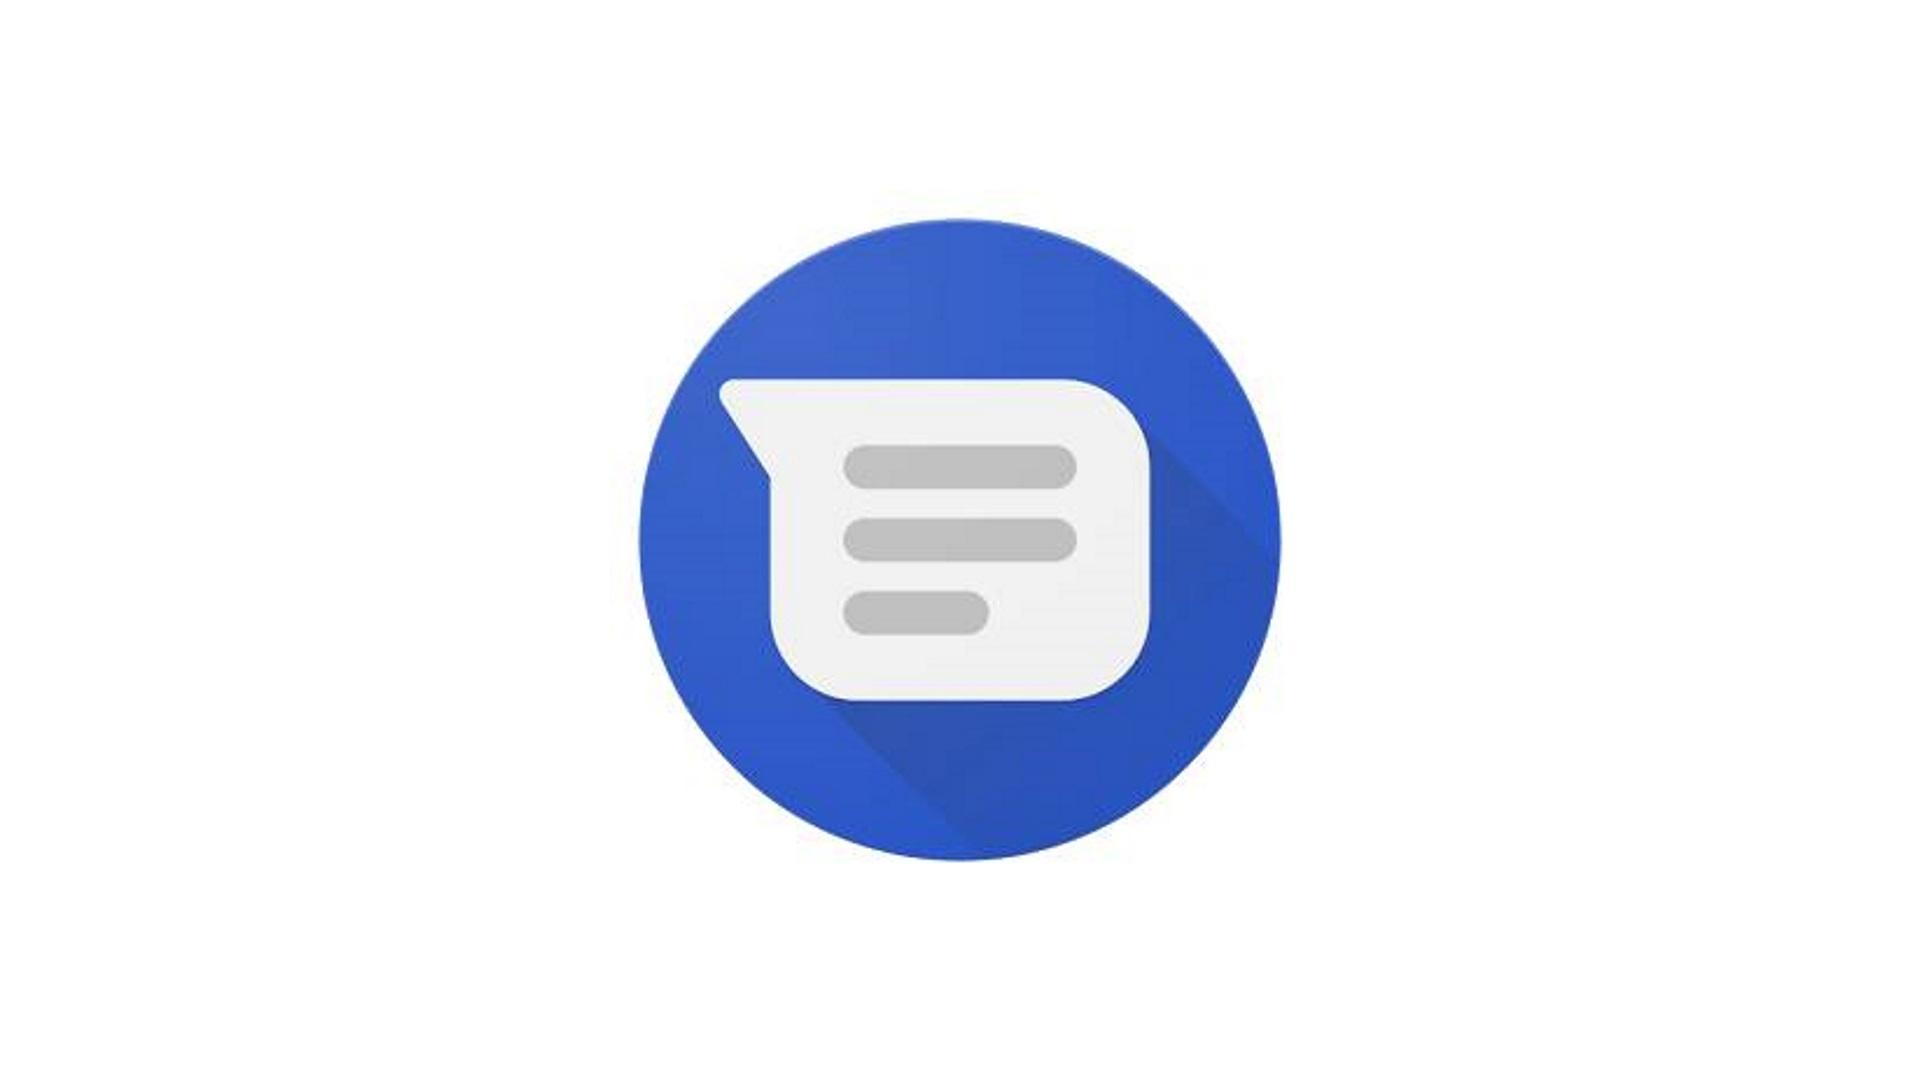 「Android メッセージ」アプリv2.3.270で通知バーでの既読が可能に